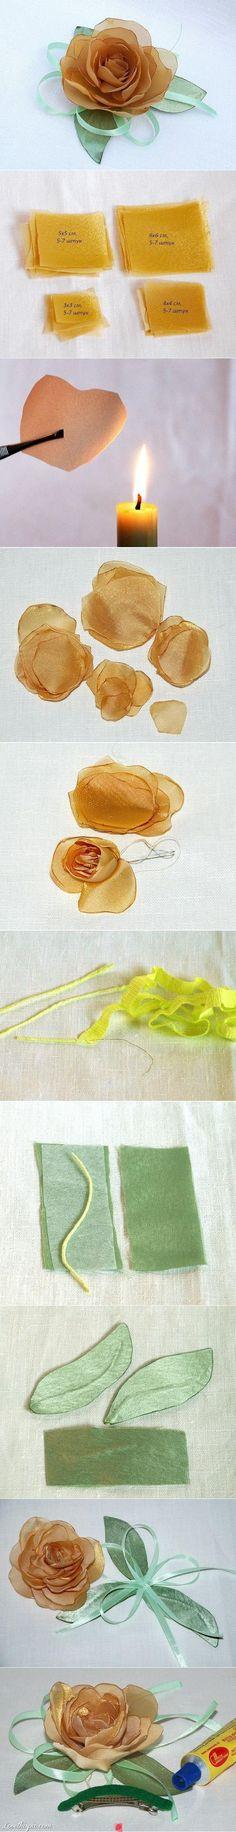 DIY Hair Flower Bow flowers diy crafts home made easy crafts craft idea crafts ideas diy ideas diy crafts diy idea do it yourself diy projects diy craft handmade